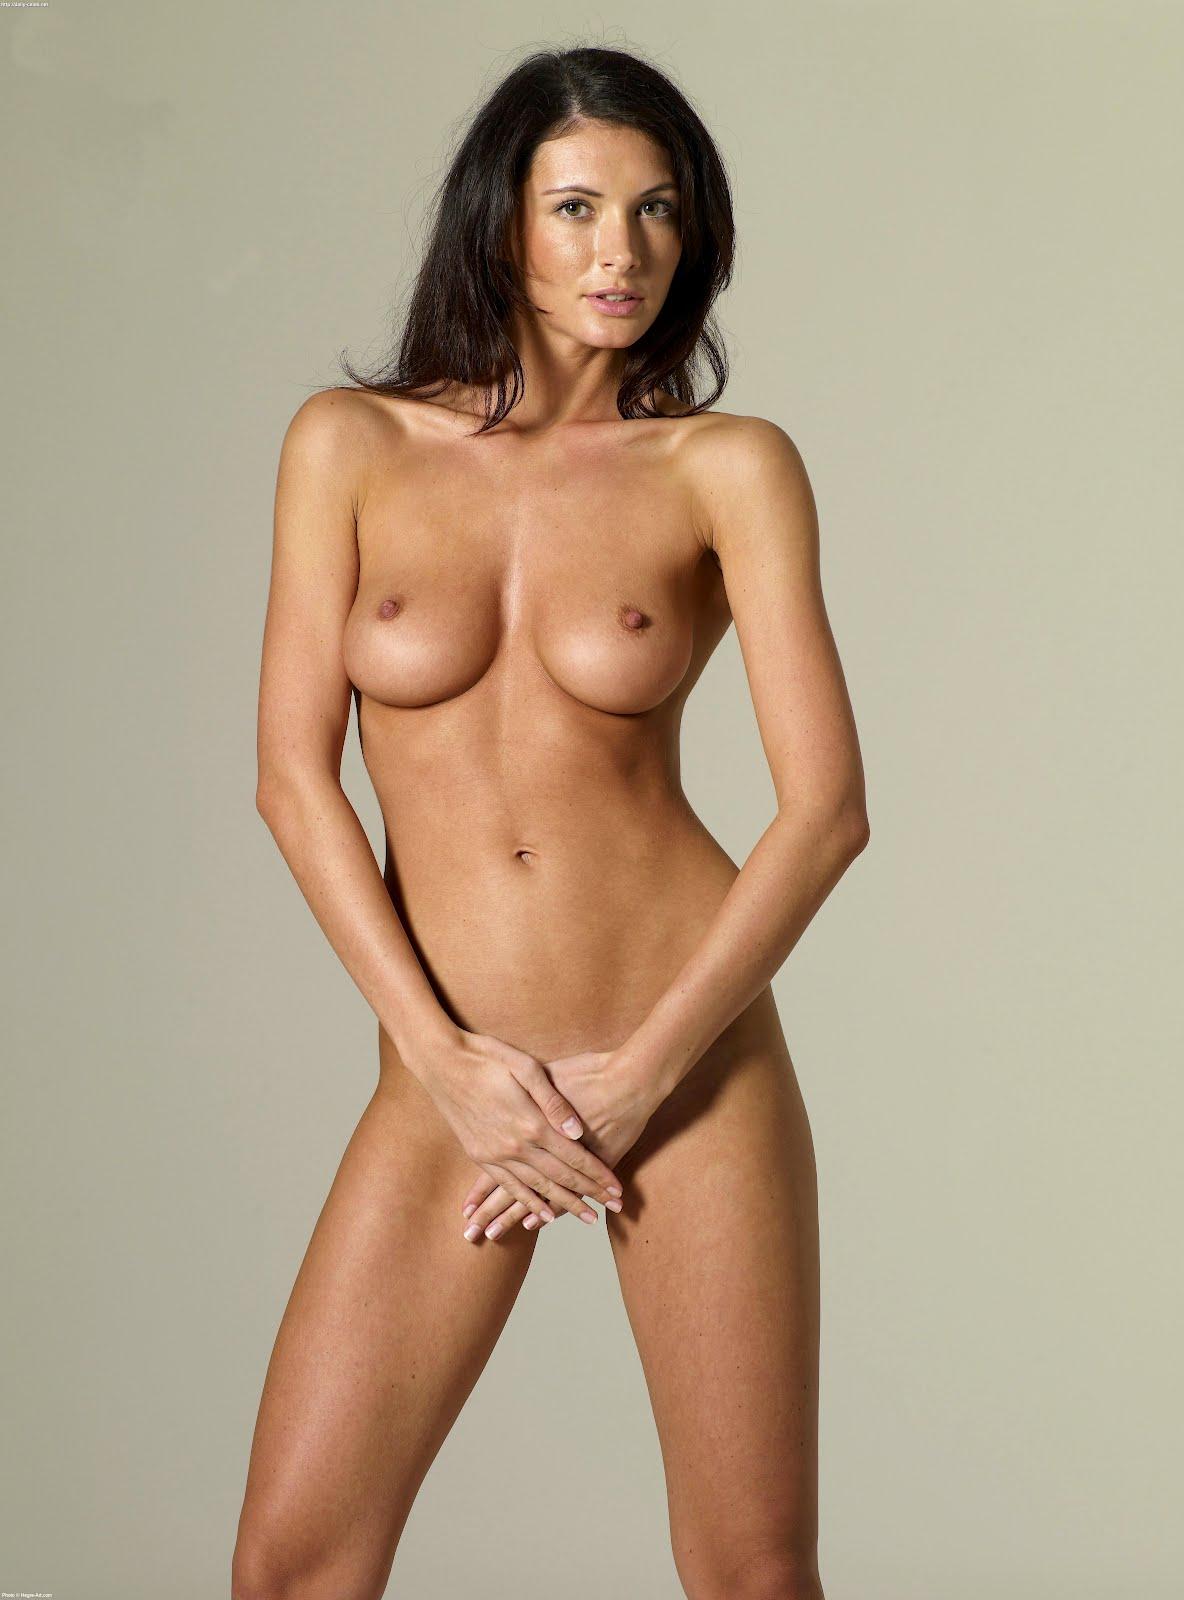 marian rivera nude adobe